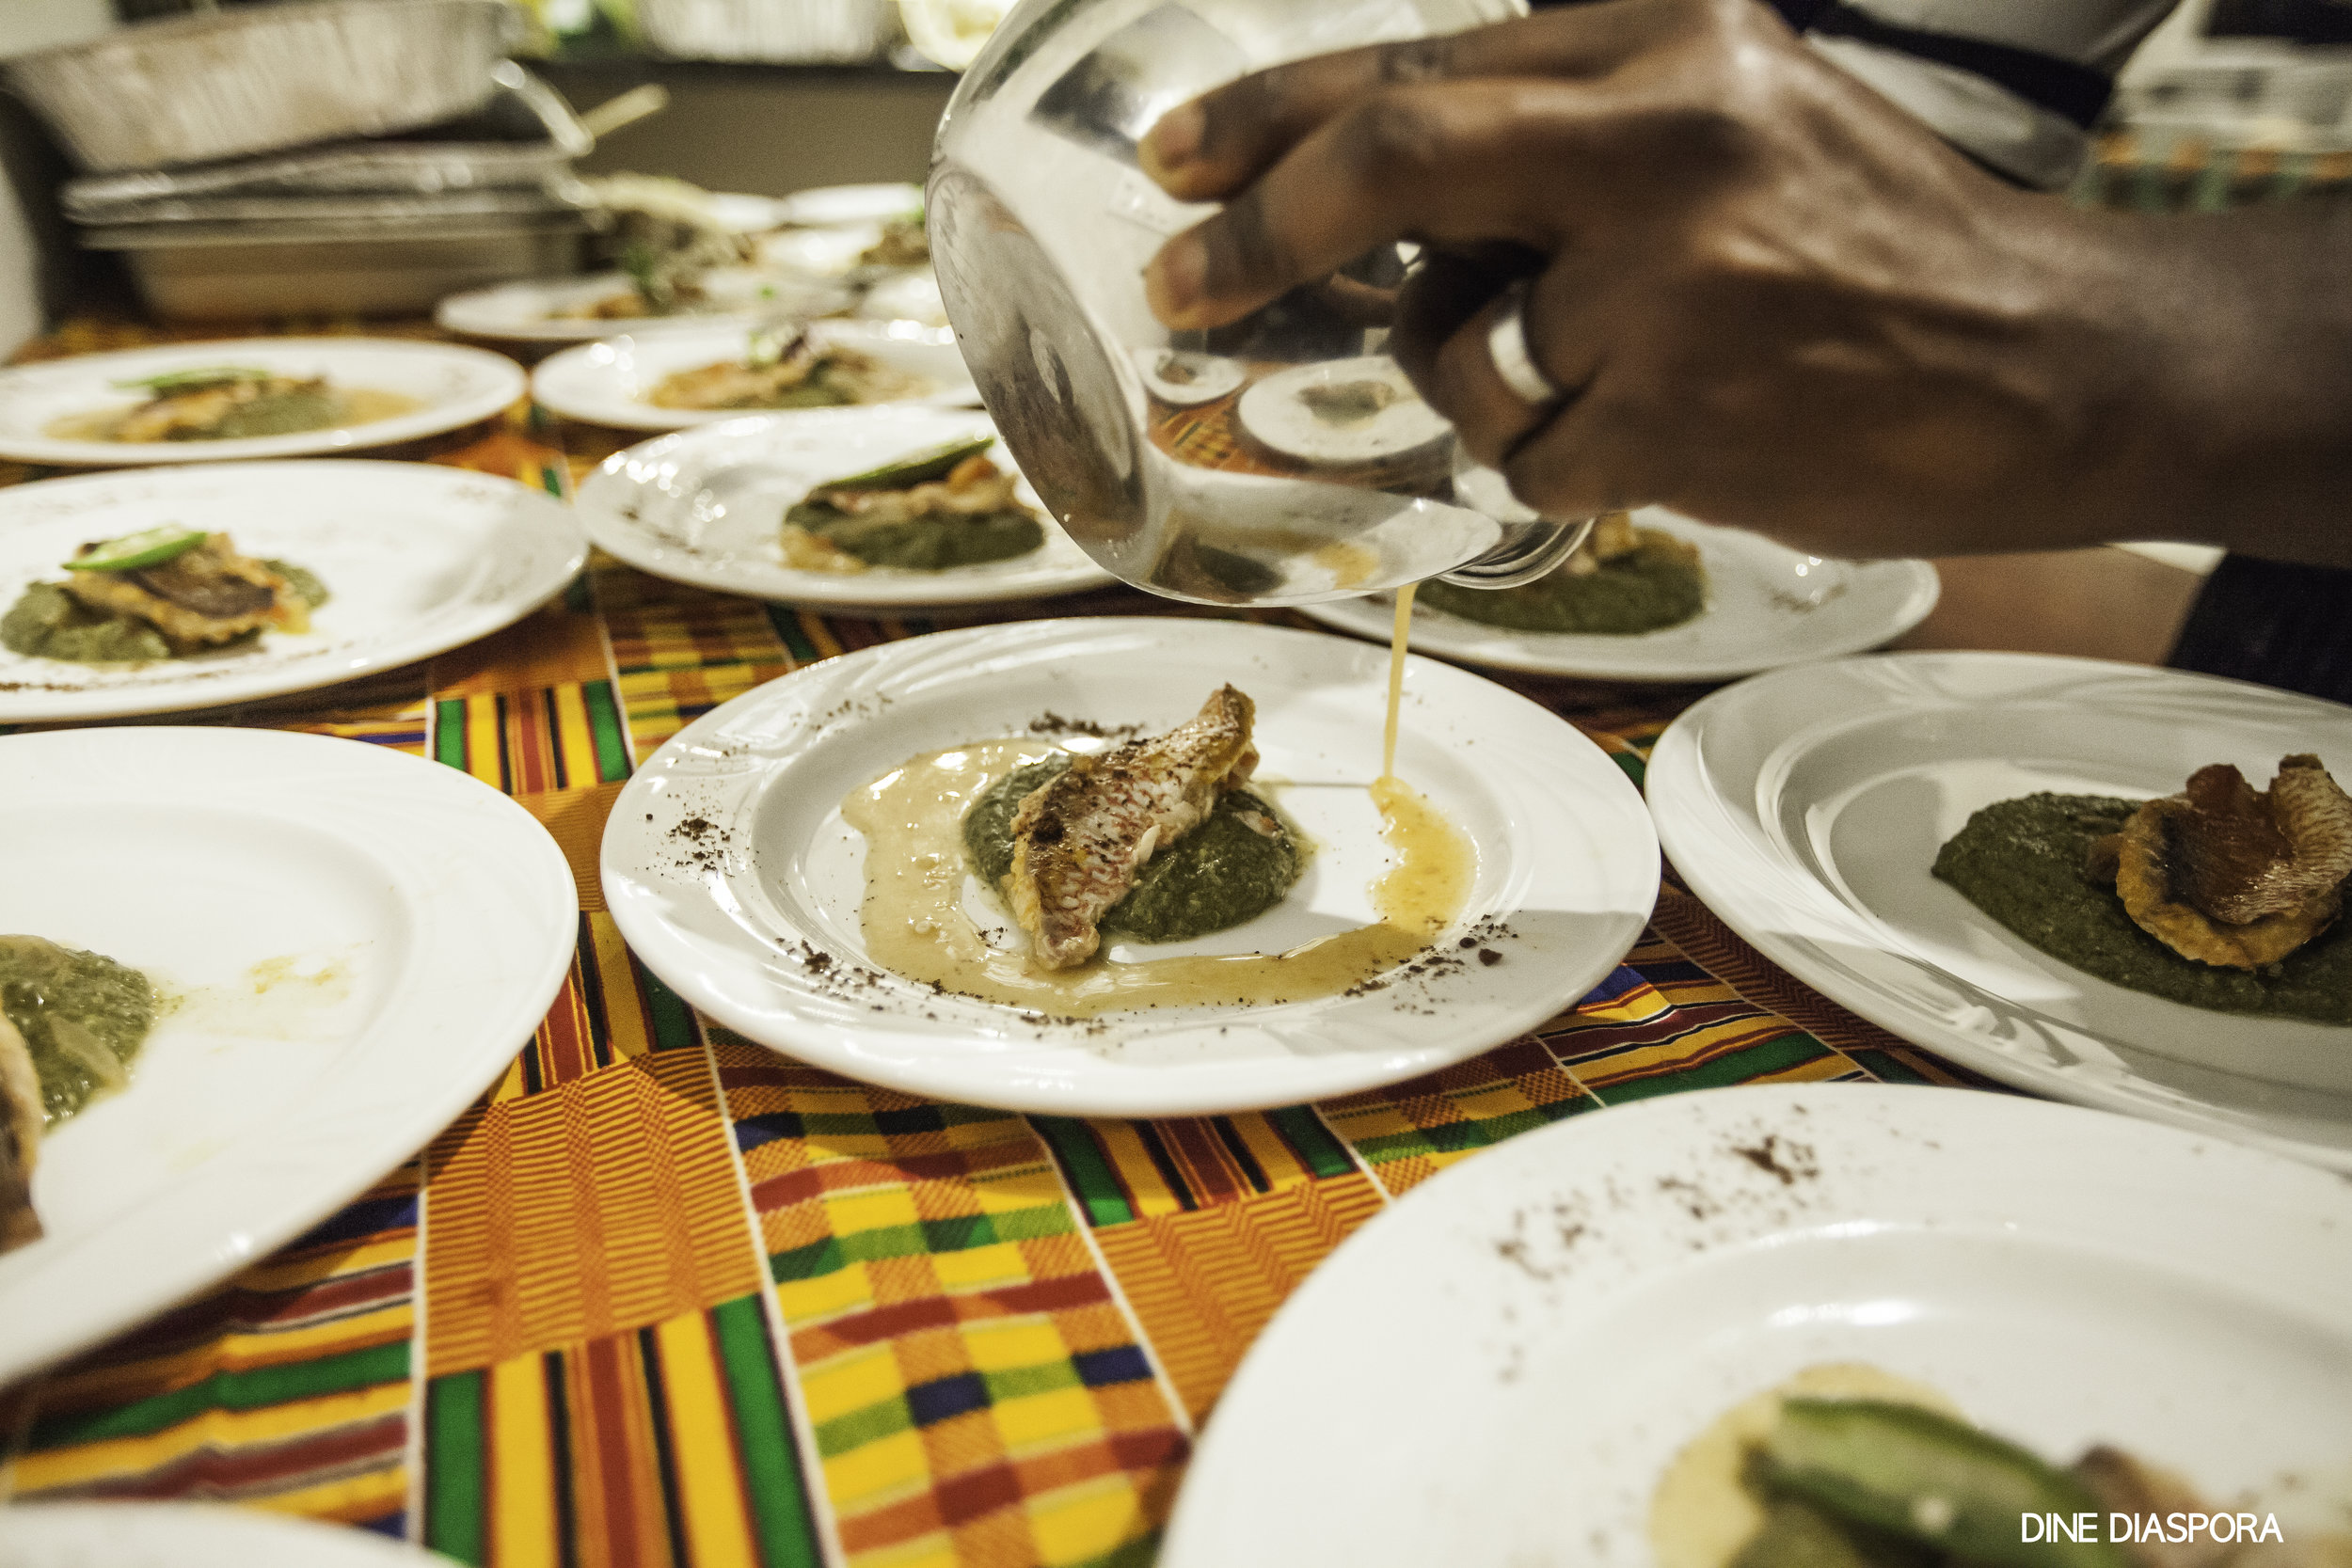 DinnerwithChefPierre-7450.jpg